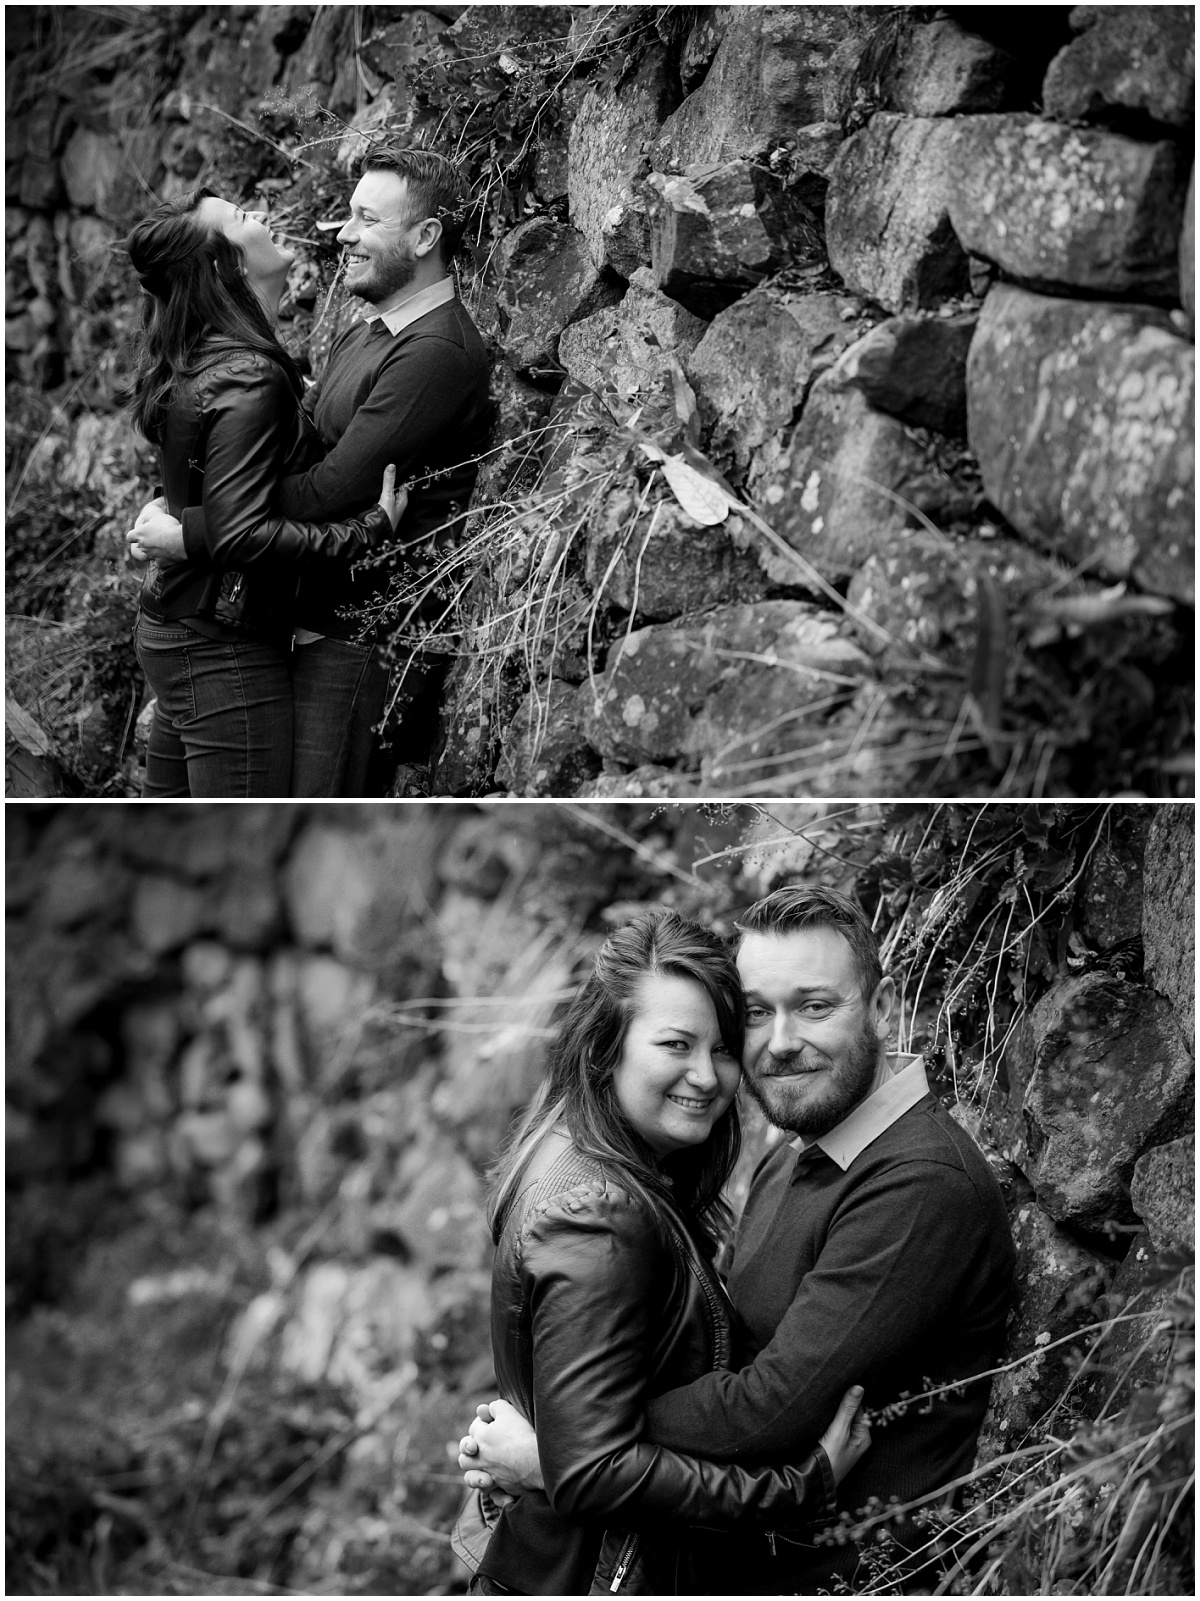 Amazing Day Photography - Langley Wedding Photographer - UBC Engagement Session - Gastown Engagement Session - Pub Engagement Session - Vancouver Photographer (2).jpg